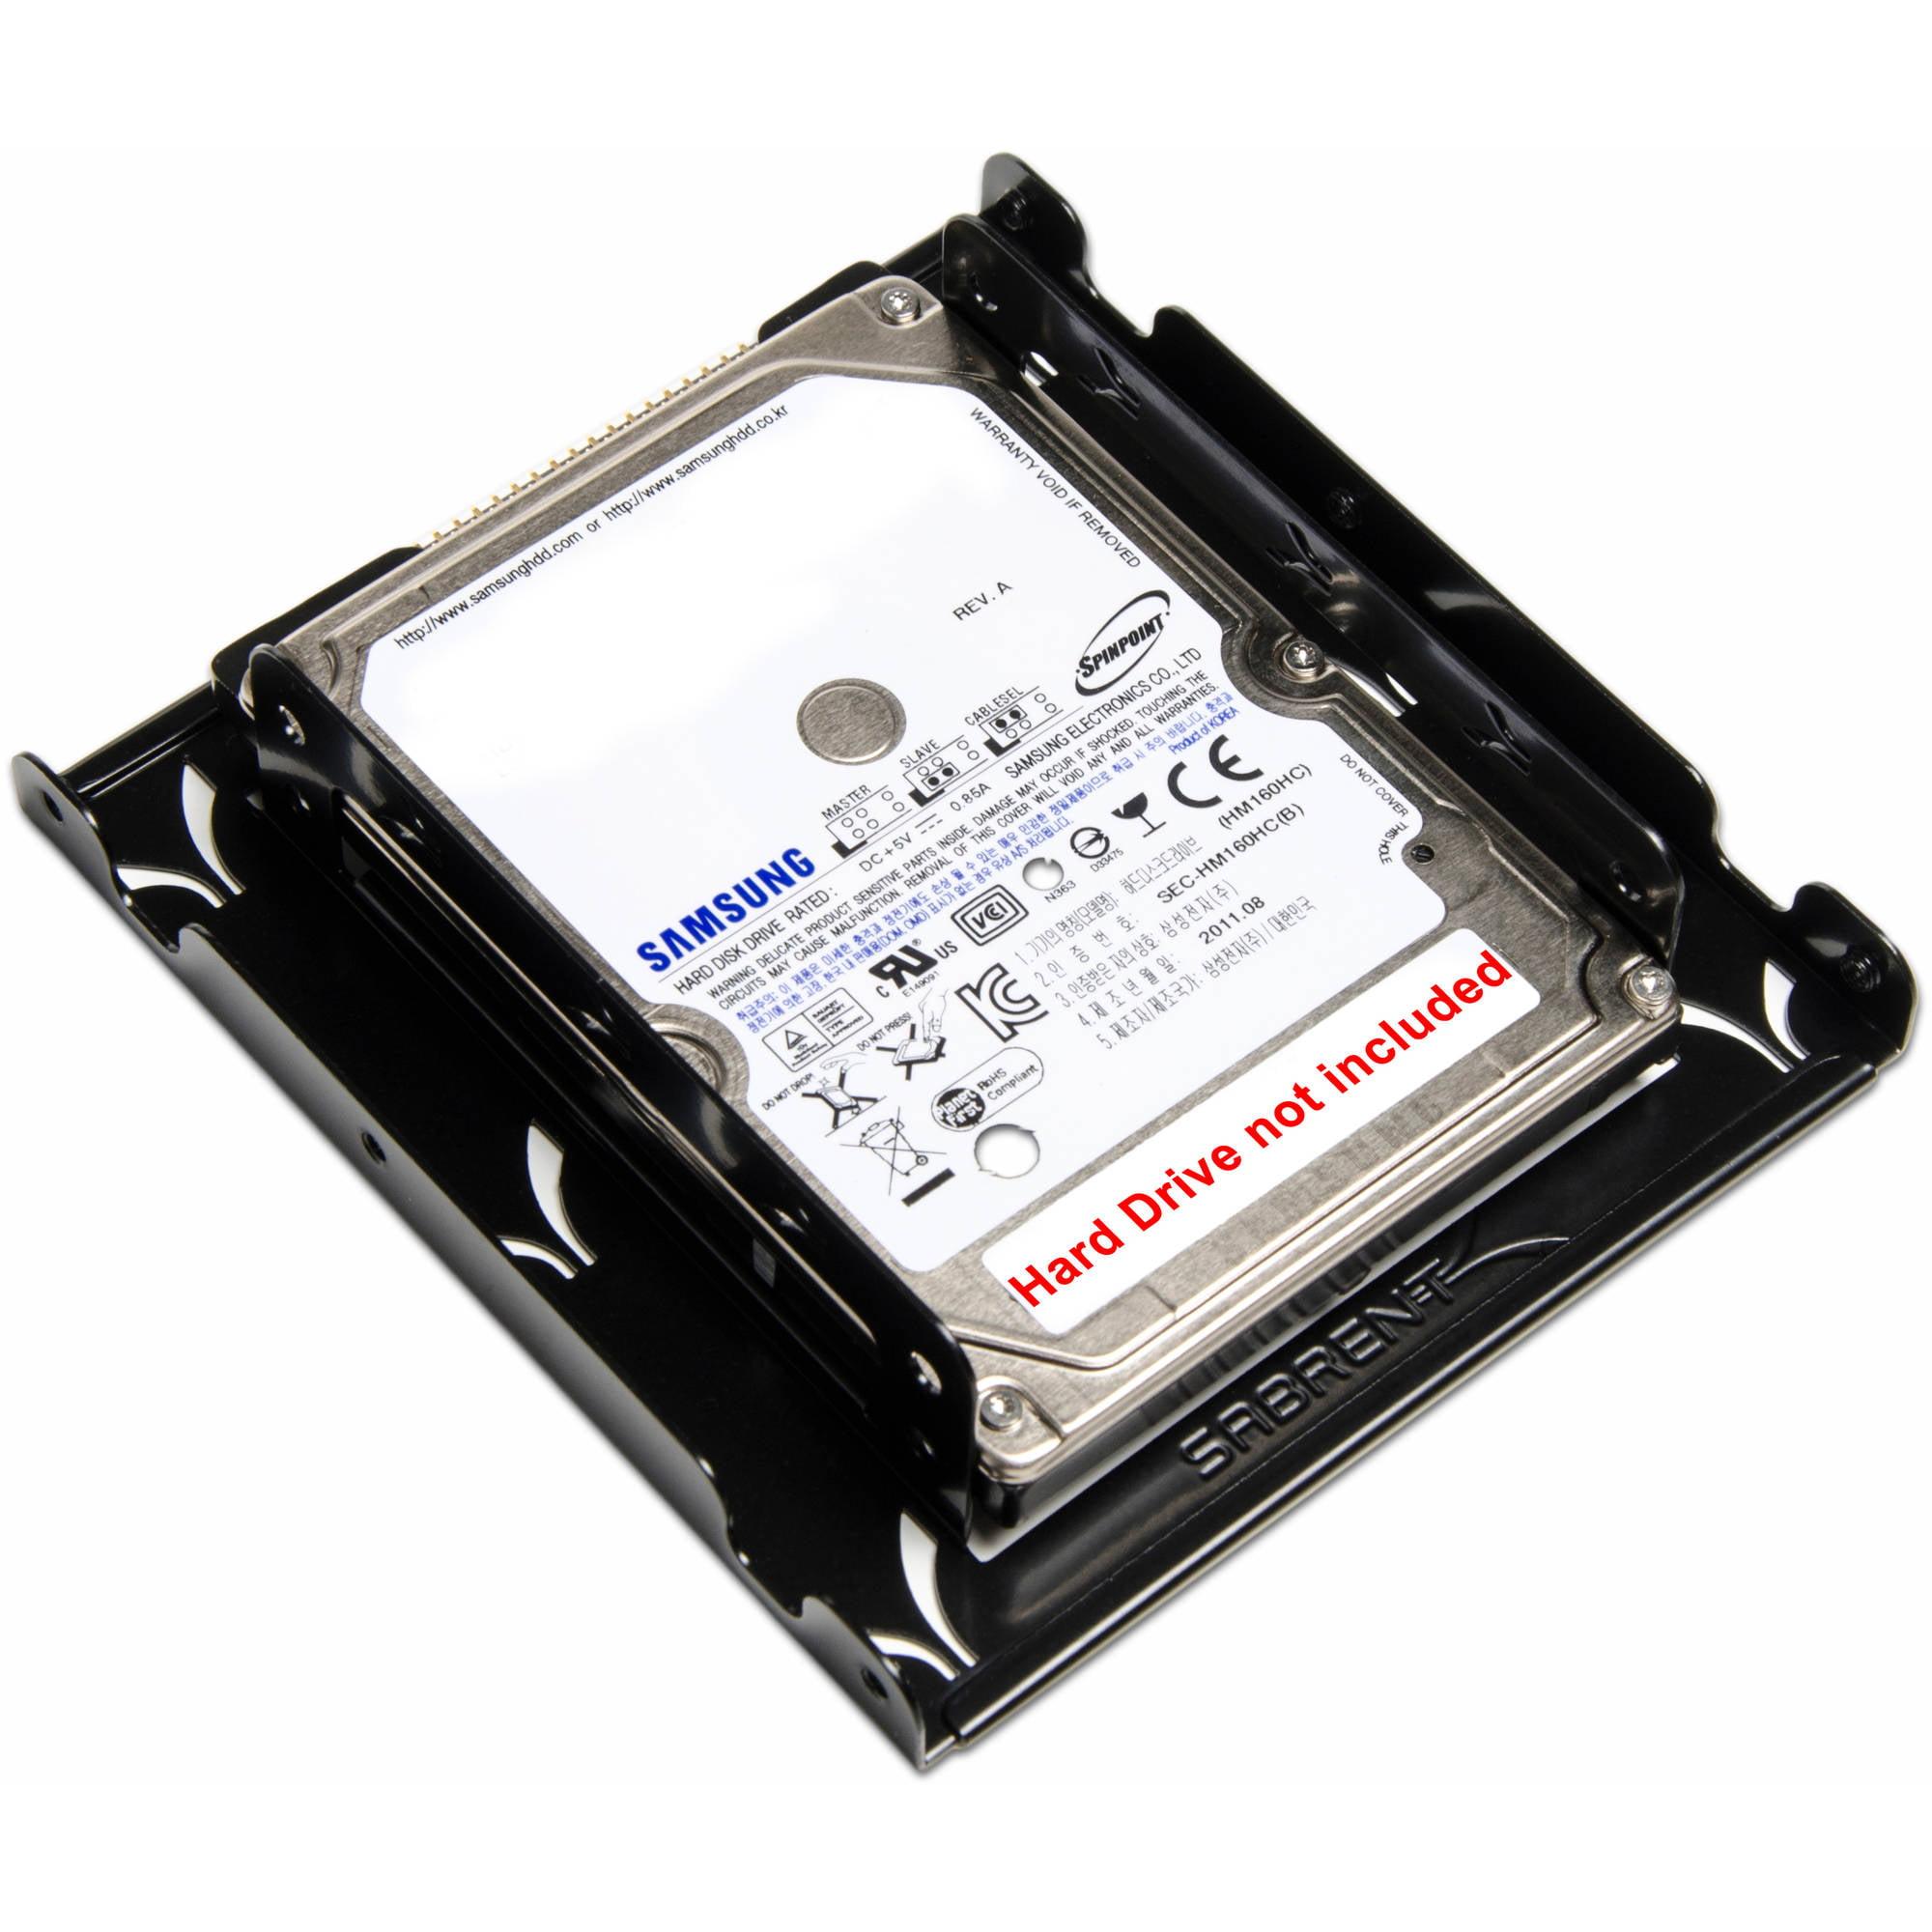 Sabrent 2 5 to 3 5 internal hard disk drive mounting bracket kit bk hddh walmart com